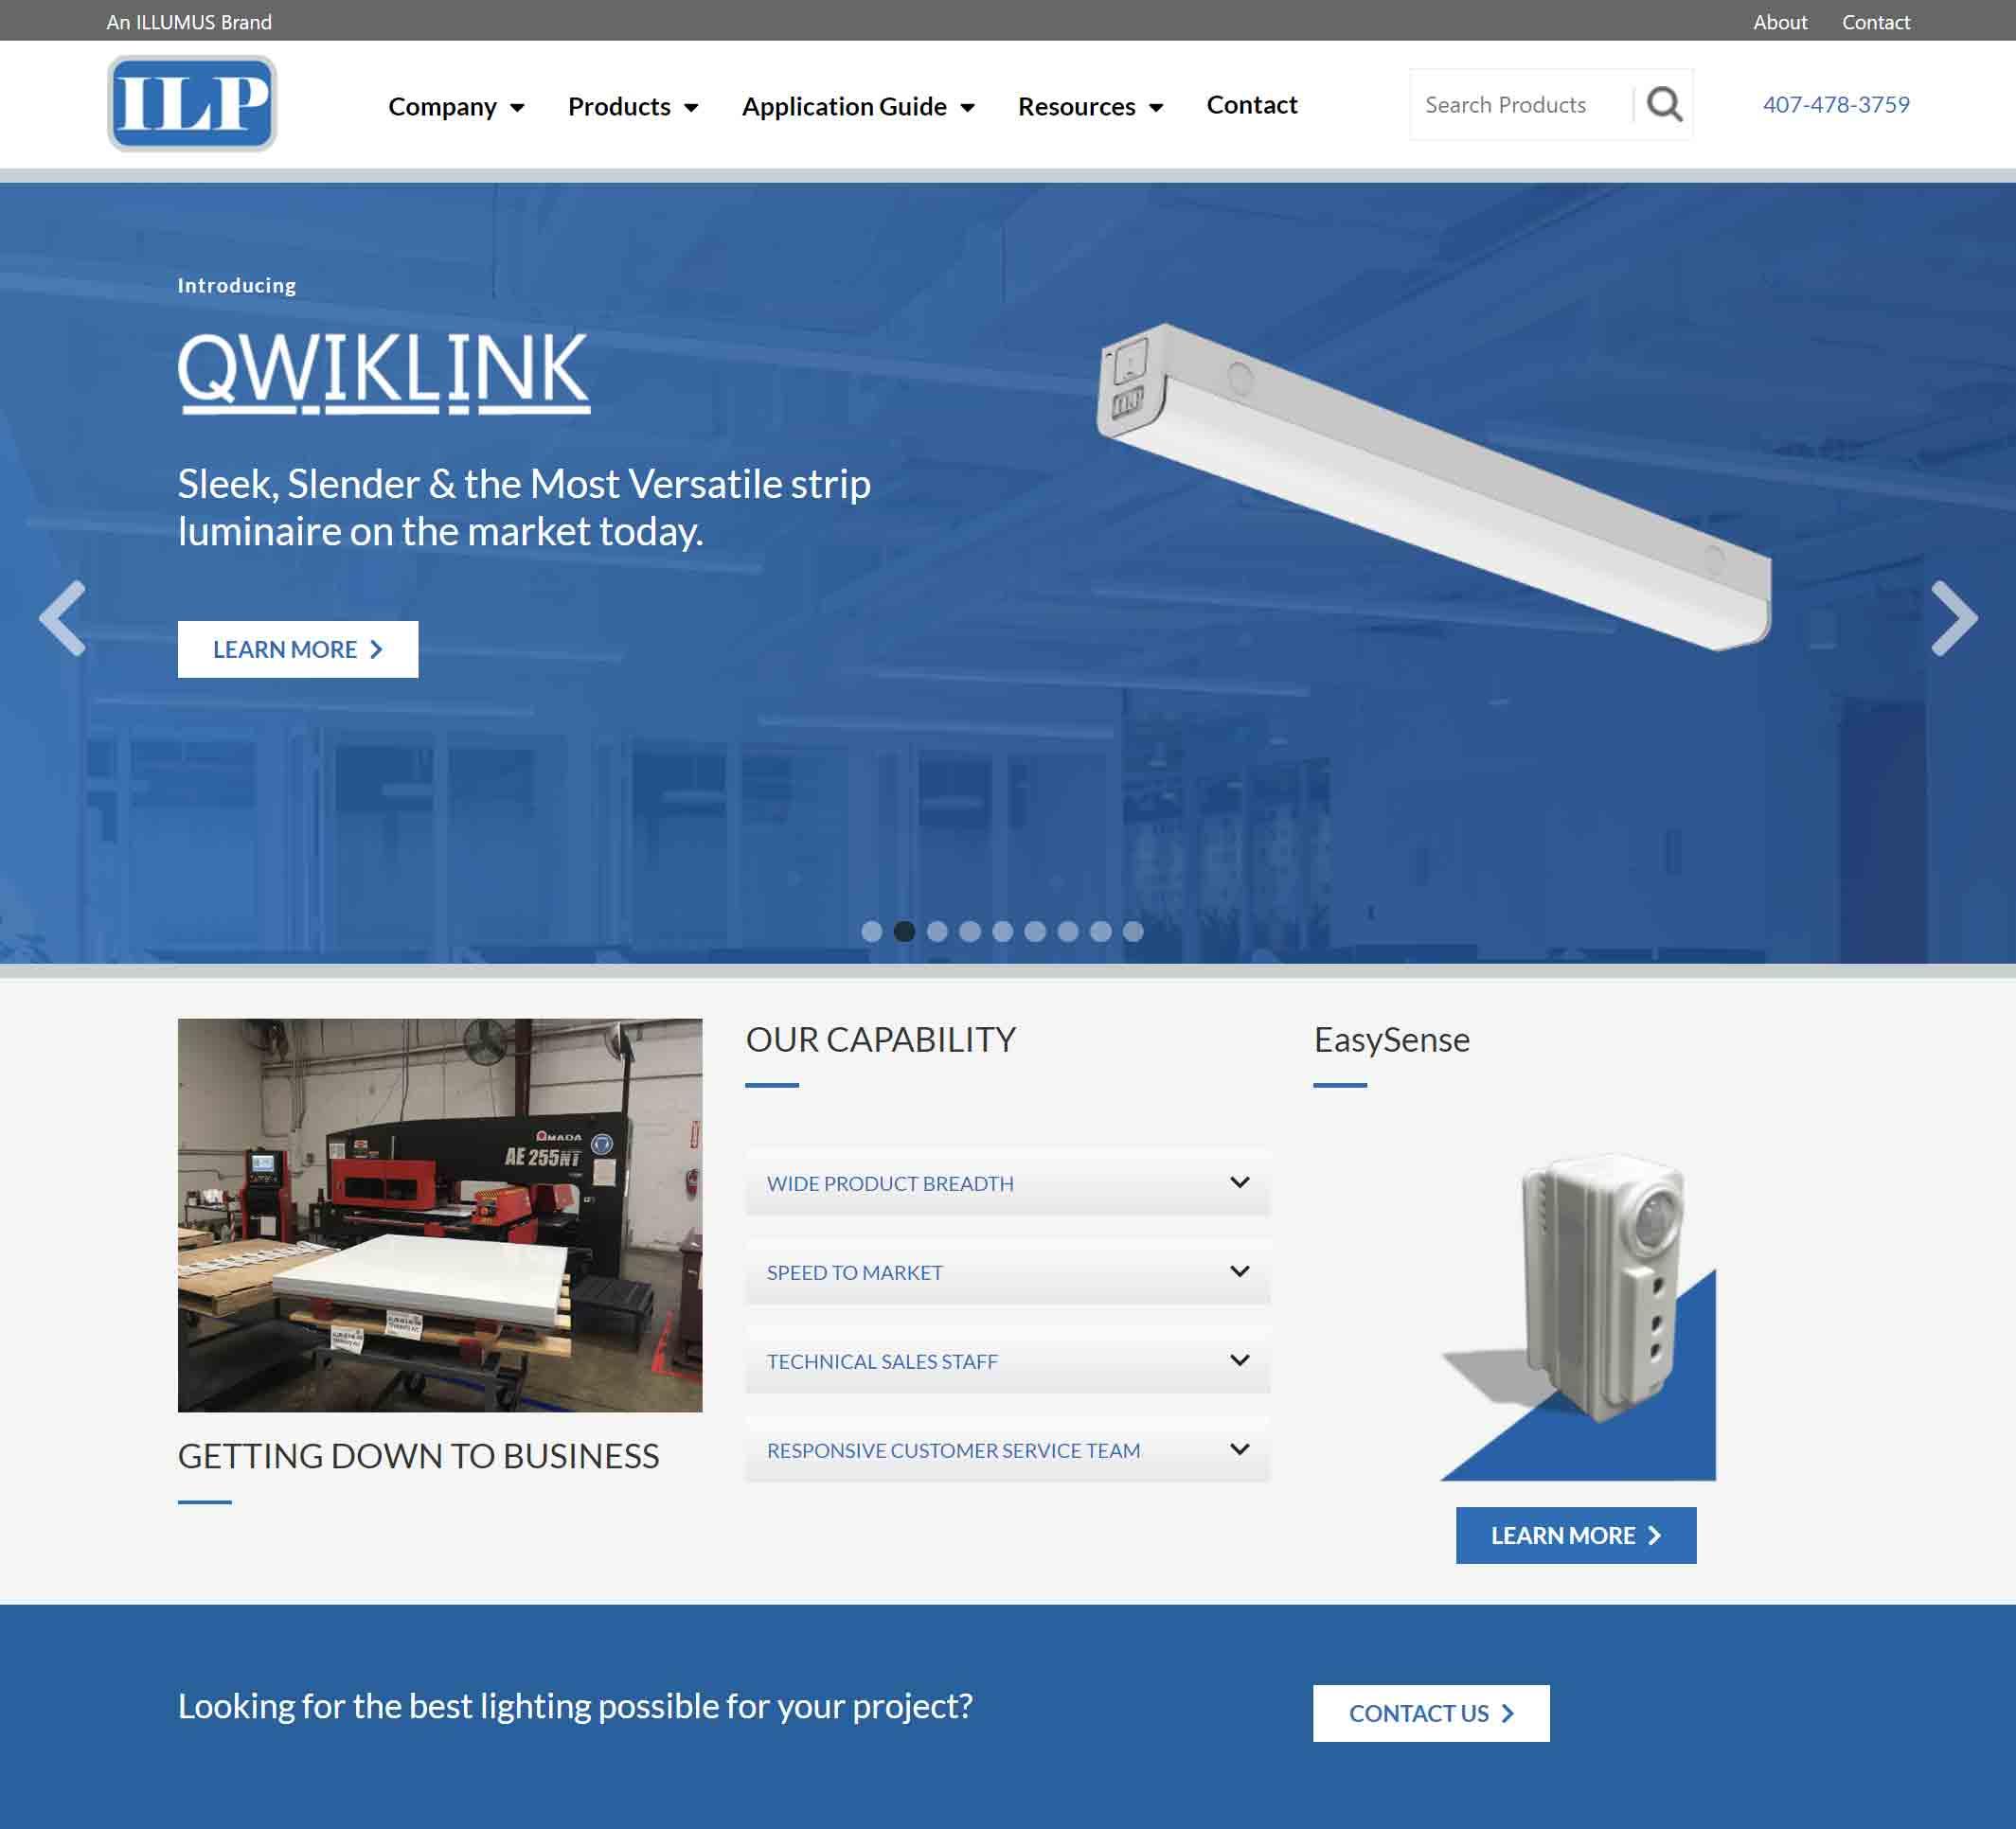 ILP homepage screenshot